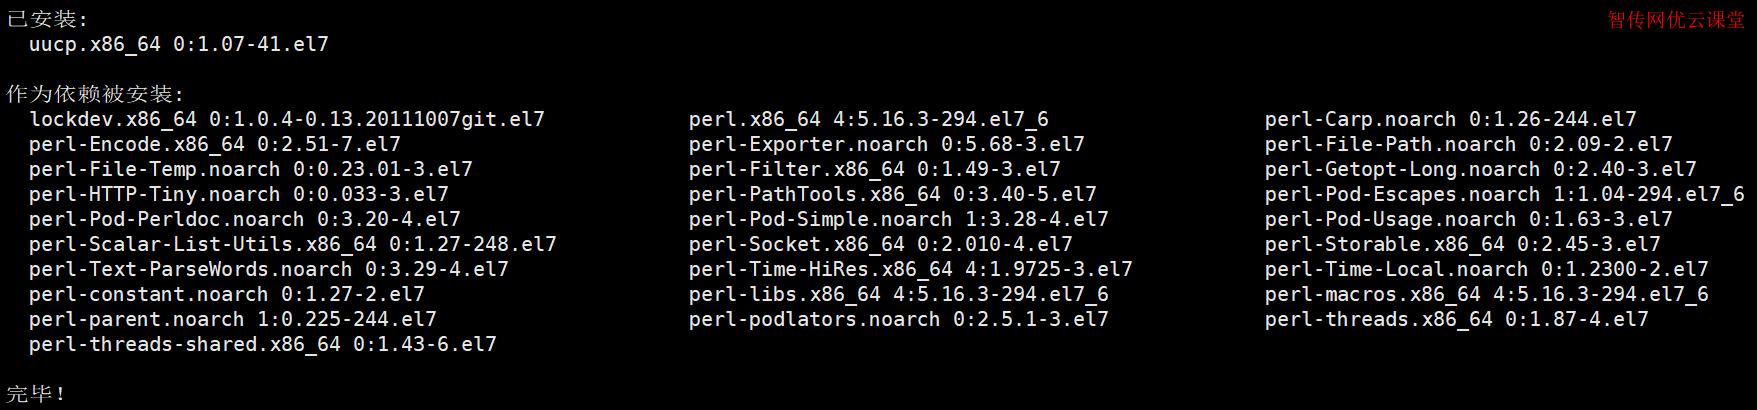 Linux安装cu命令连接路由器、交换机、防火墙的console接口